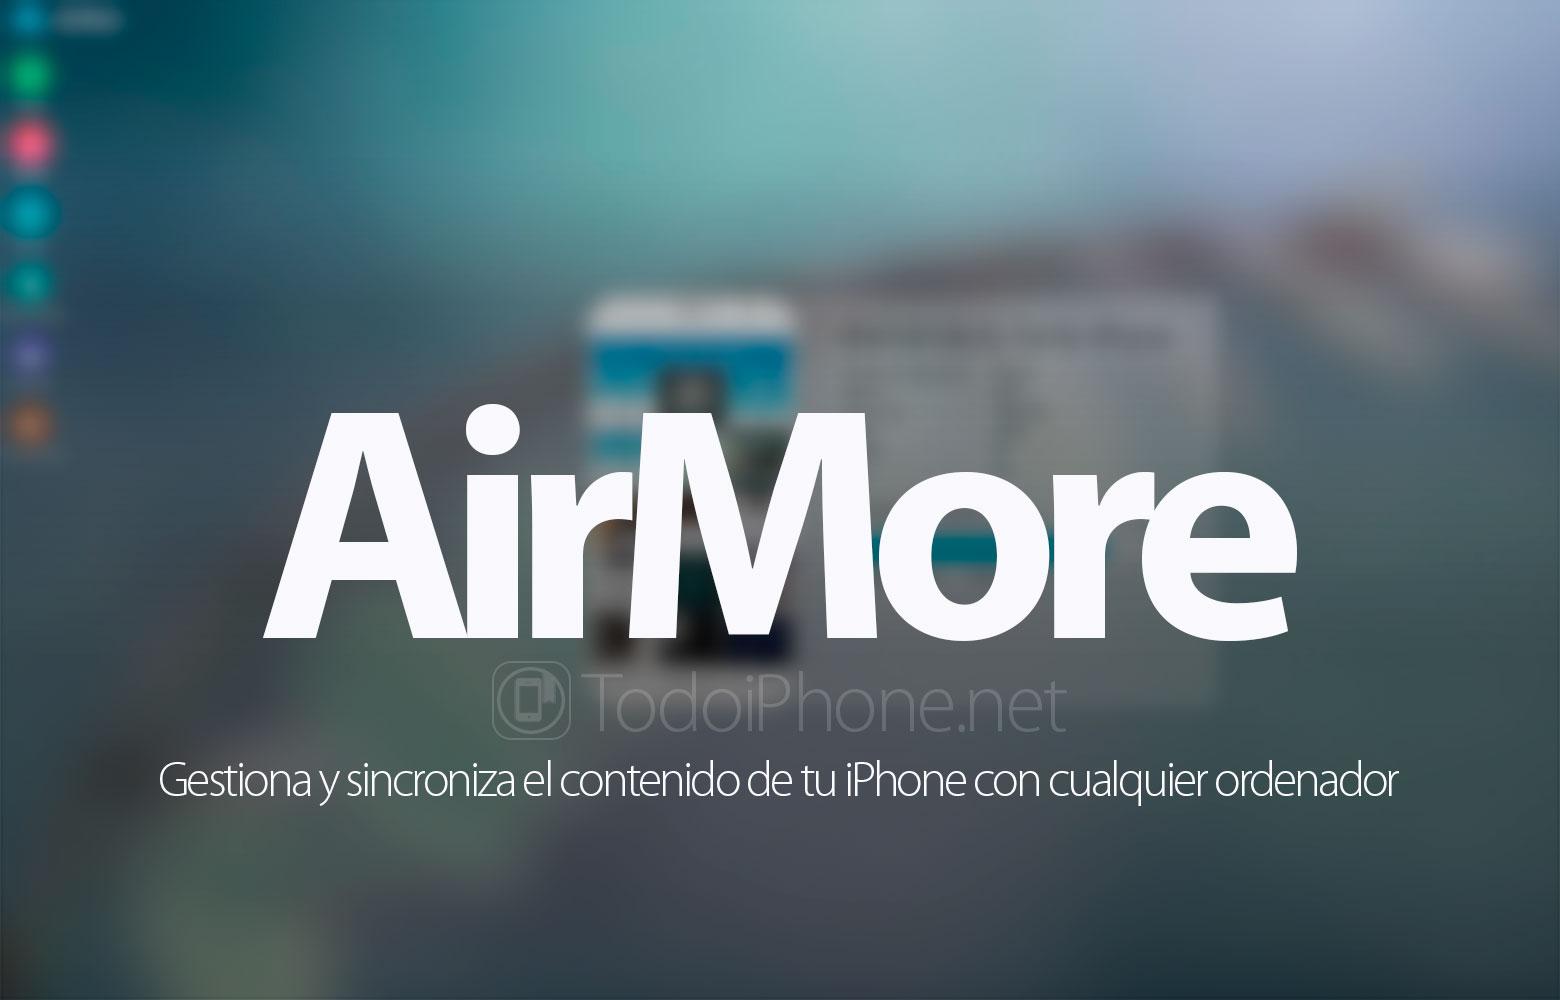 airmore-gestiona-sincroniza-contenido-iphone-ordenador